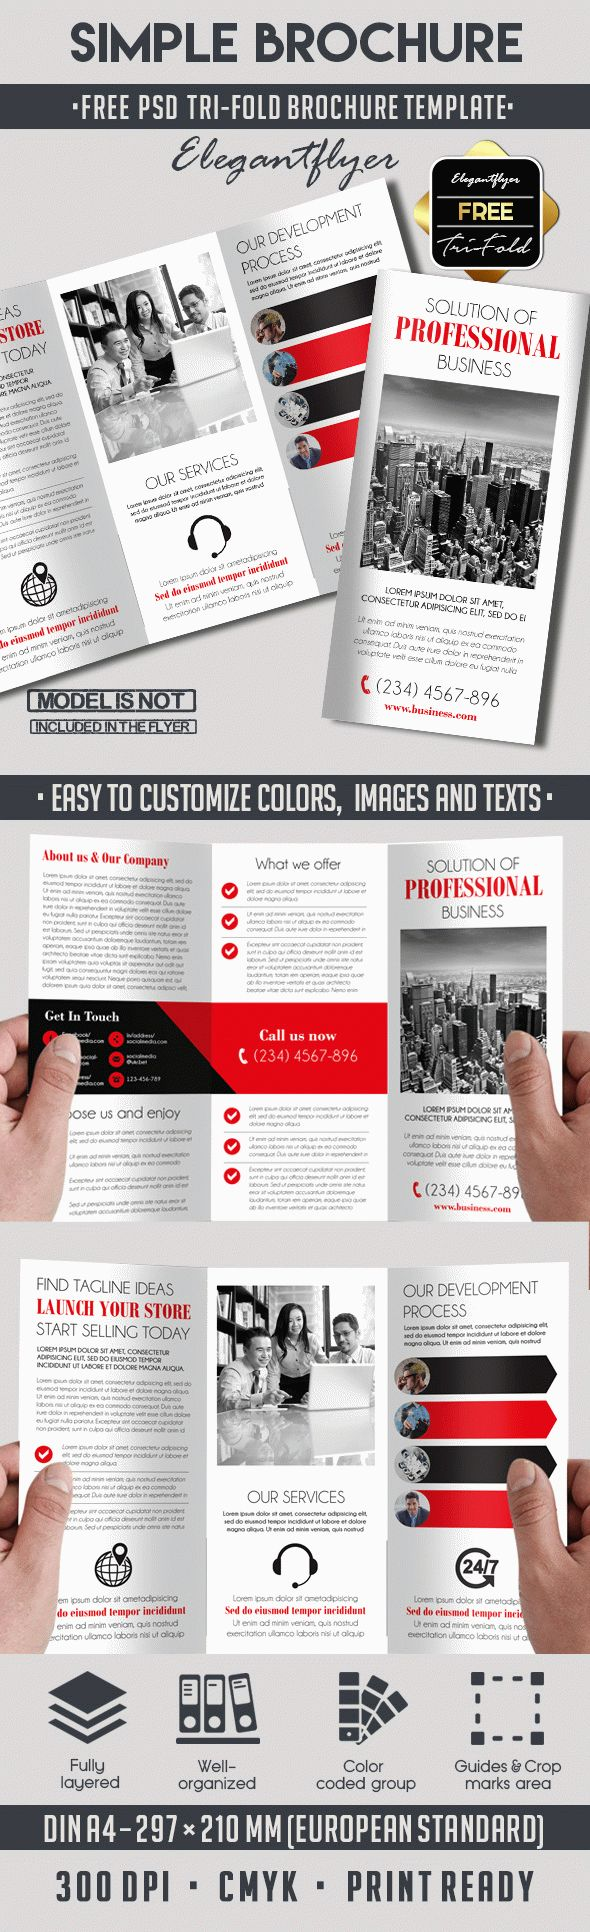 Simple free tri fold psd brochure template brochure template simple free tri fold psd brochure template wajeb Images